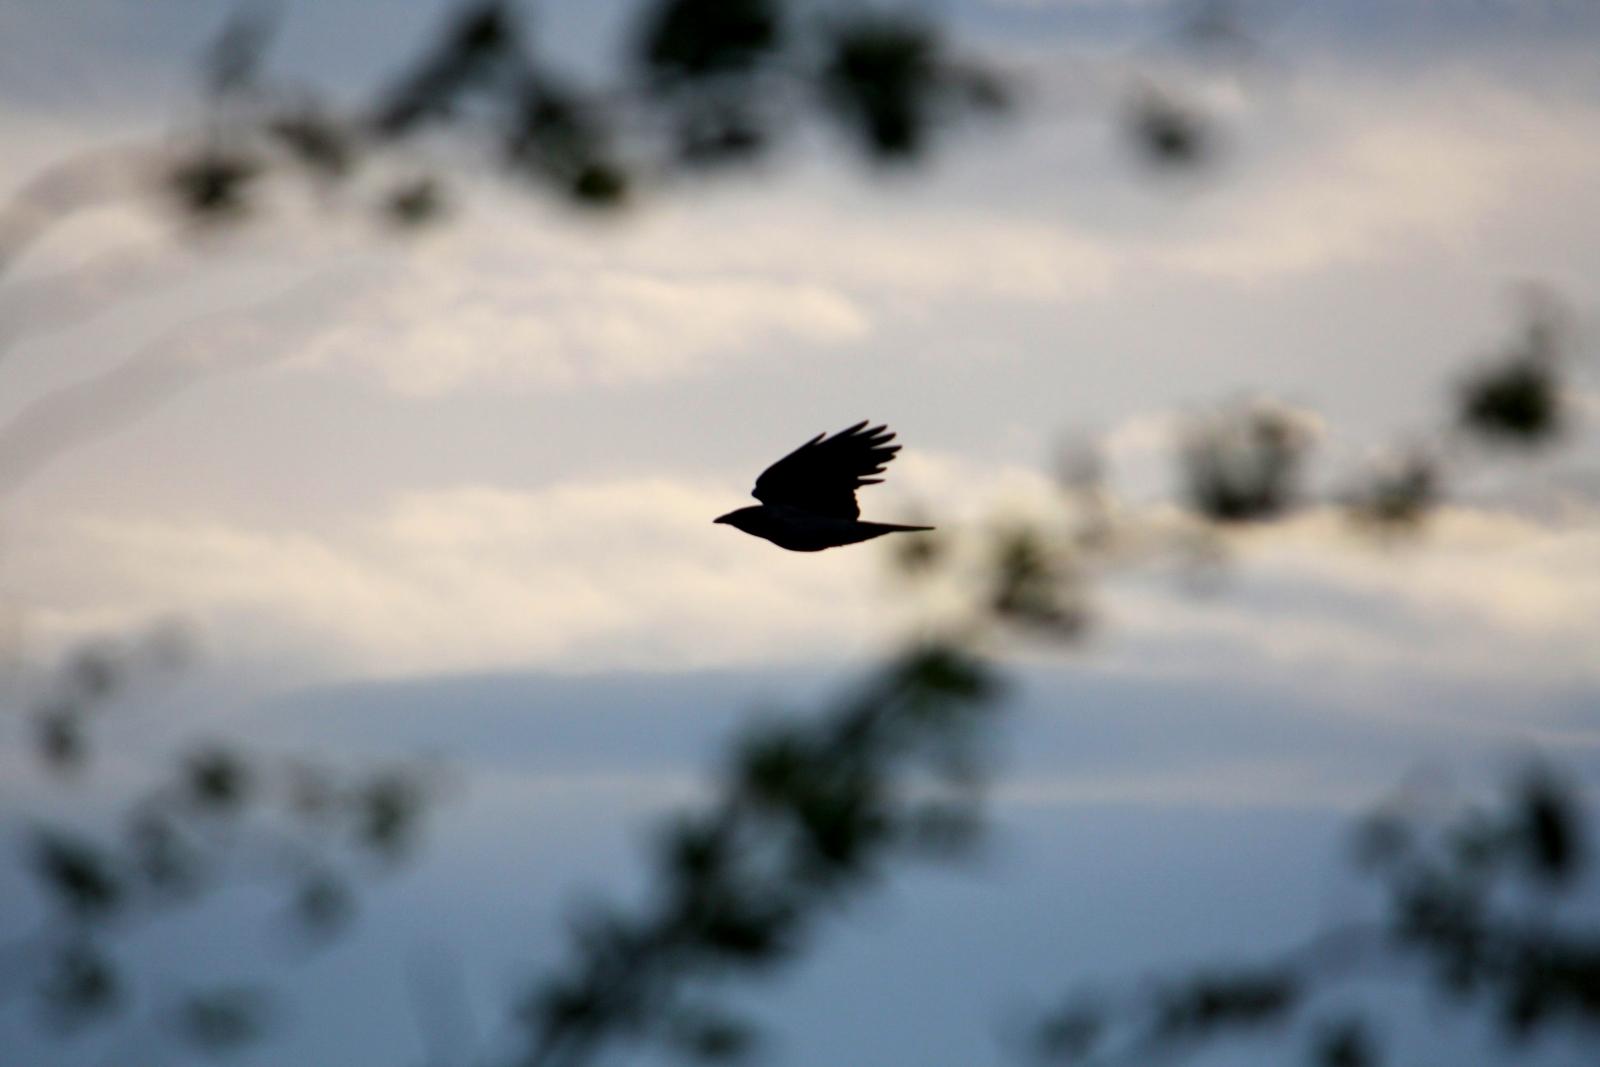 bird-like Shape or shape-Like Bird? by LoveForDetails